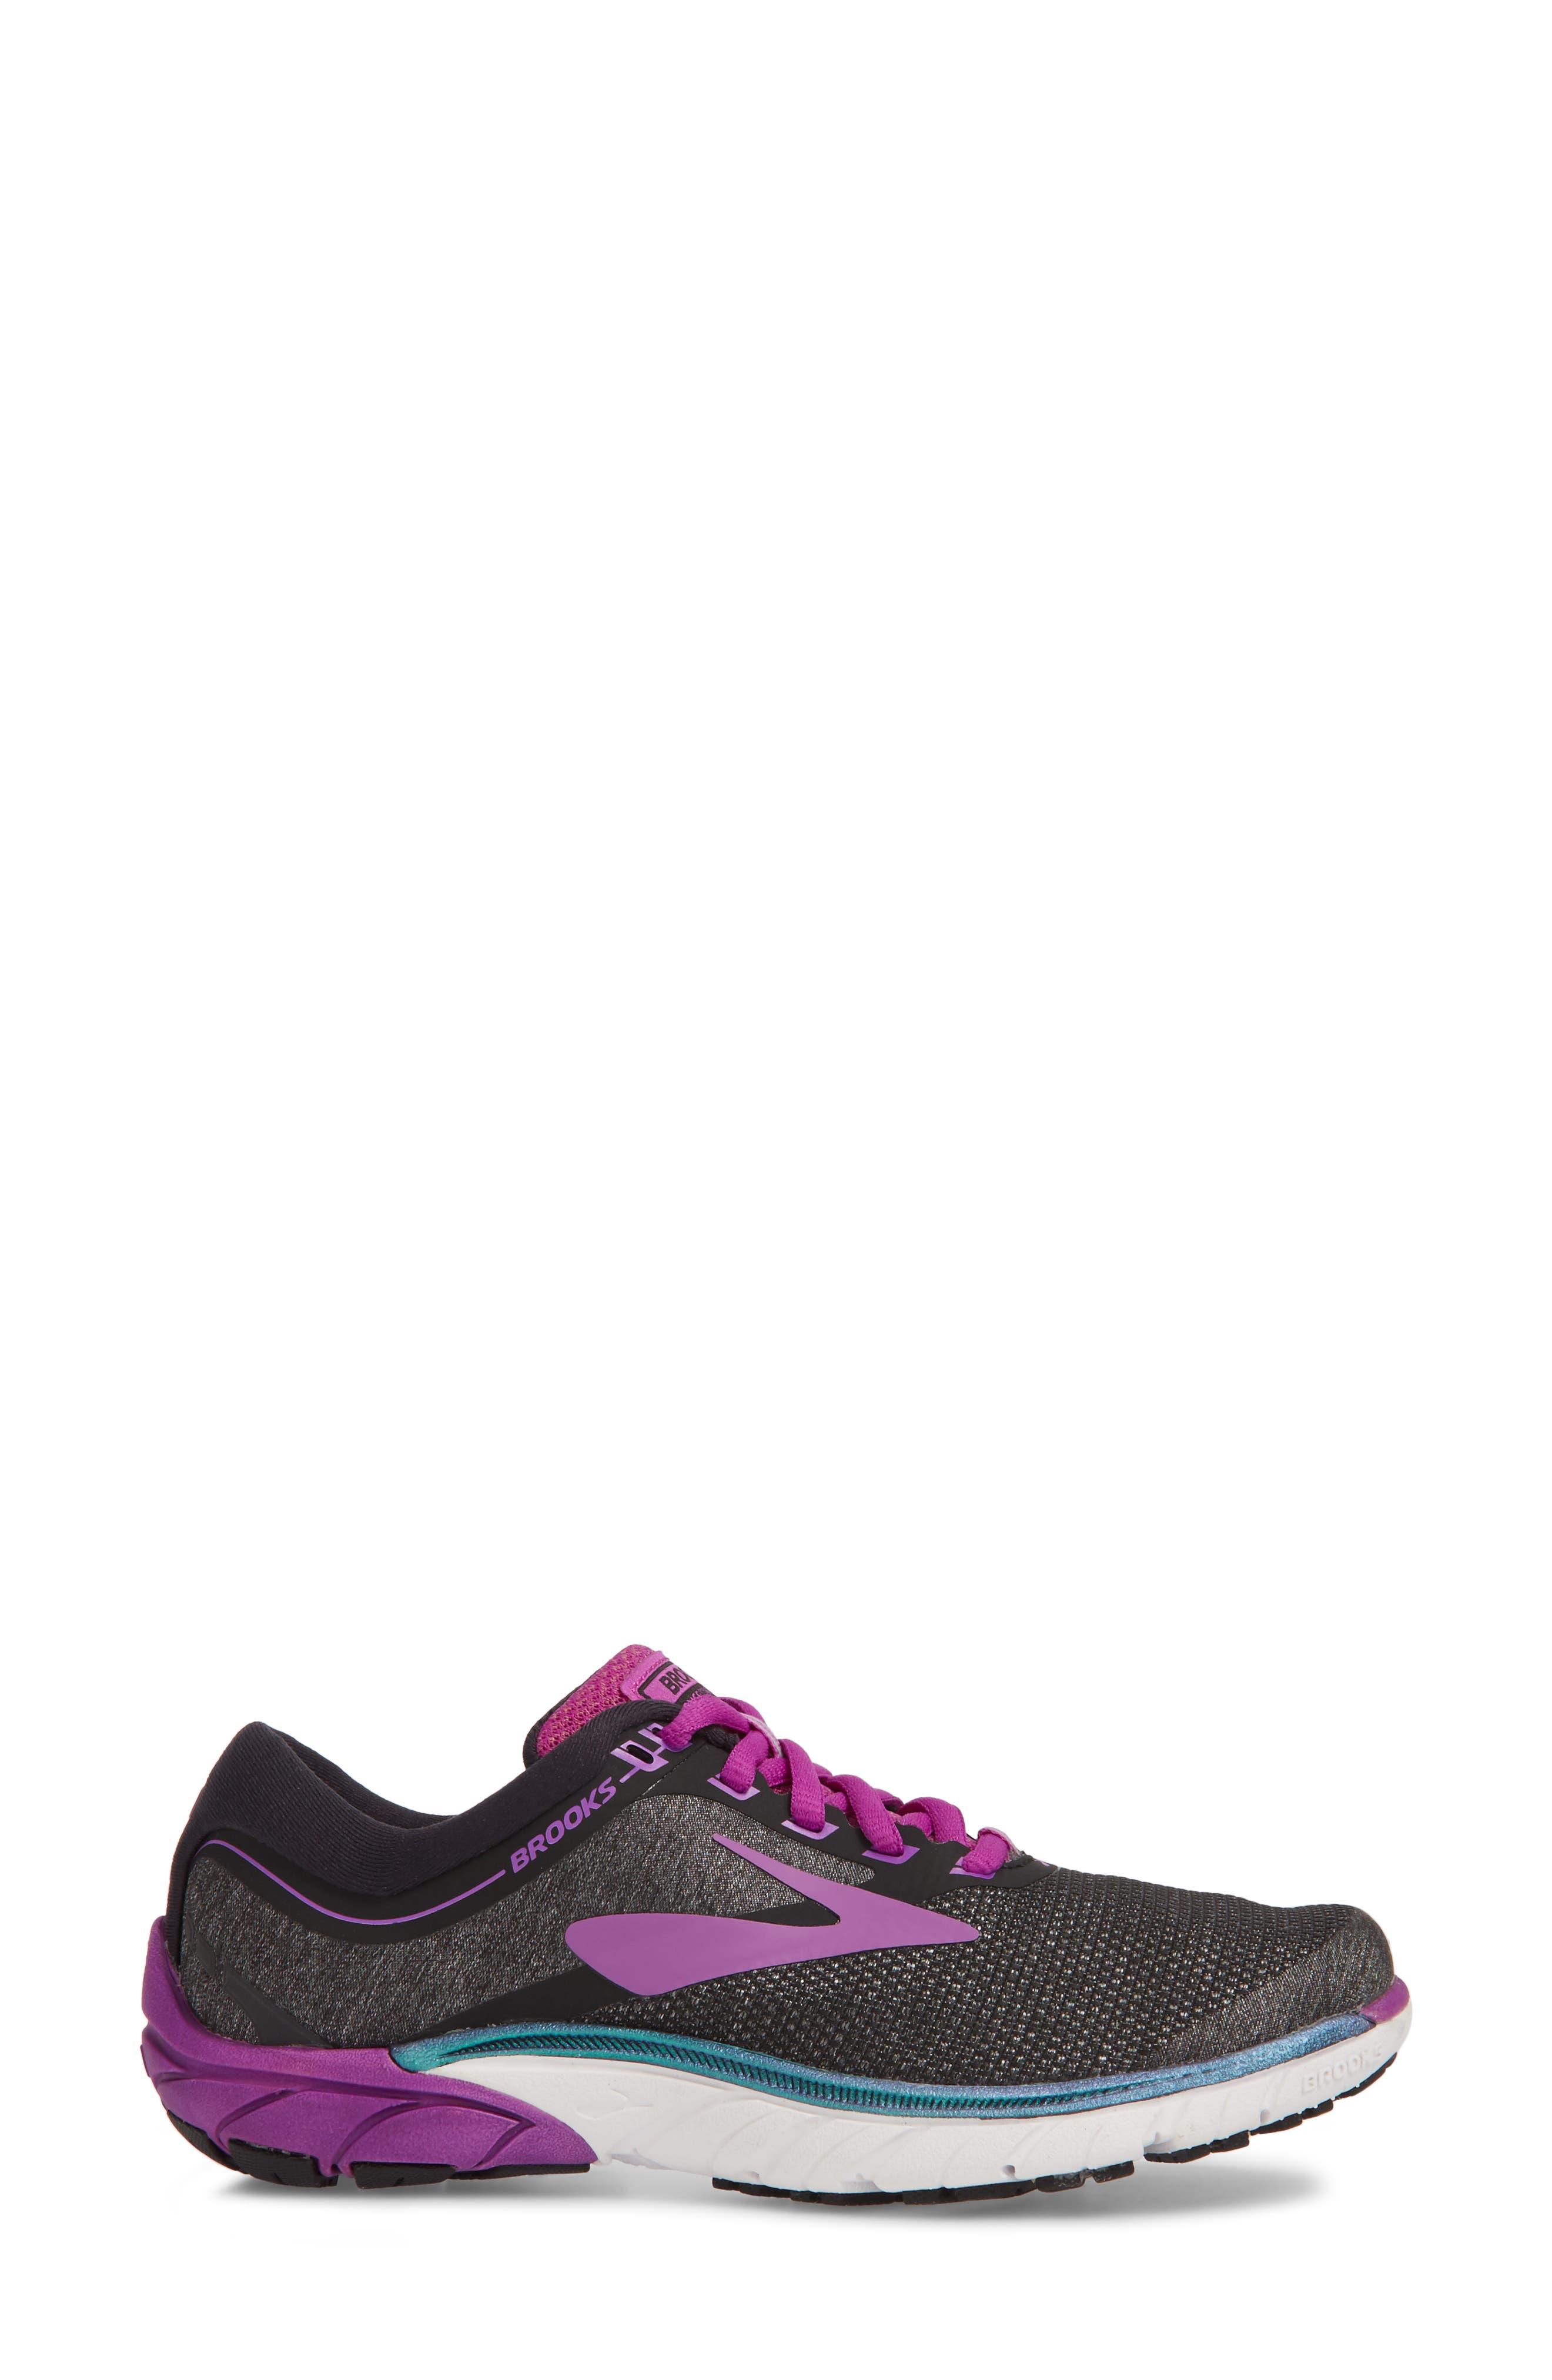 PureCadence 7 Road Running Shoe,                             Alternate thumbnail 3, color,                             BLACK/ PURPLE/ MULTI